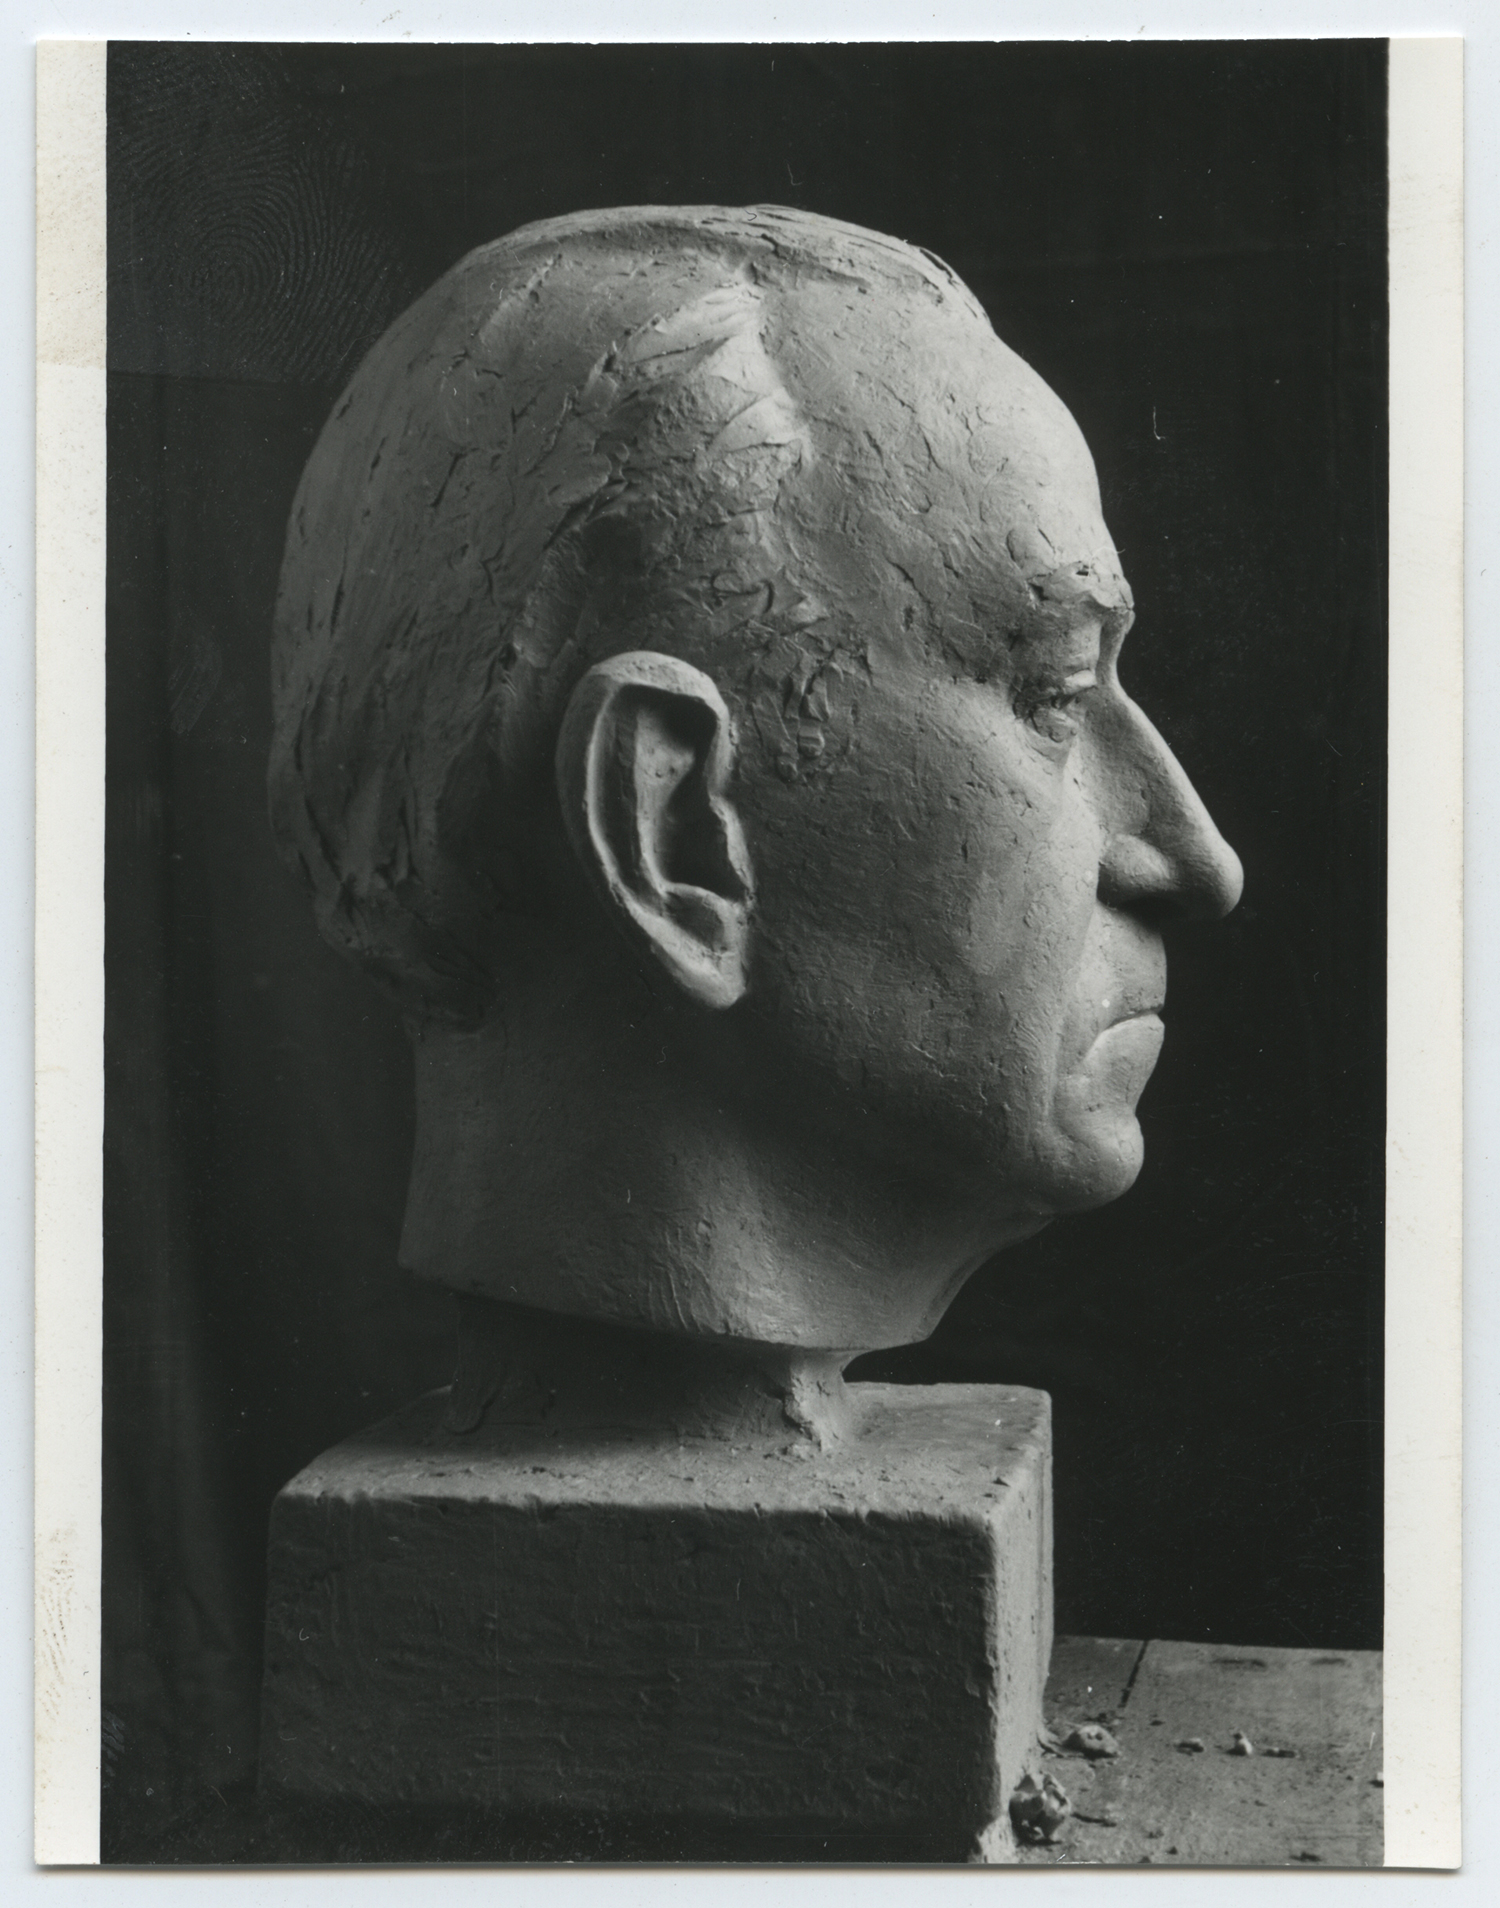 1969.12. Cabeza del compositor Pablo Sorozábal, mayólica, 37x28x29 cms. 1969